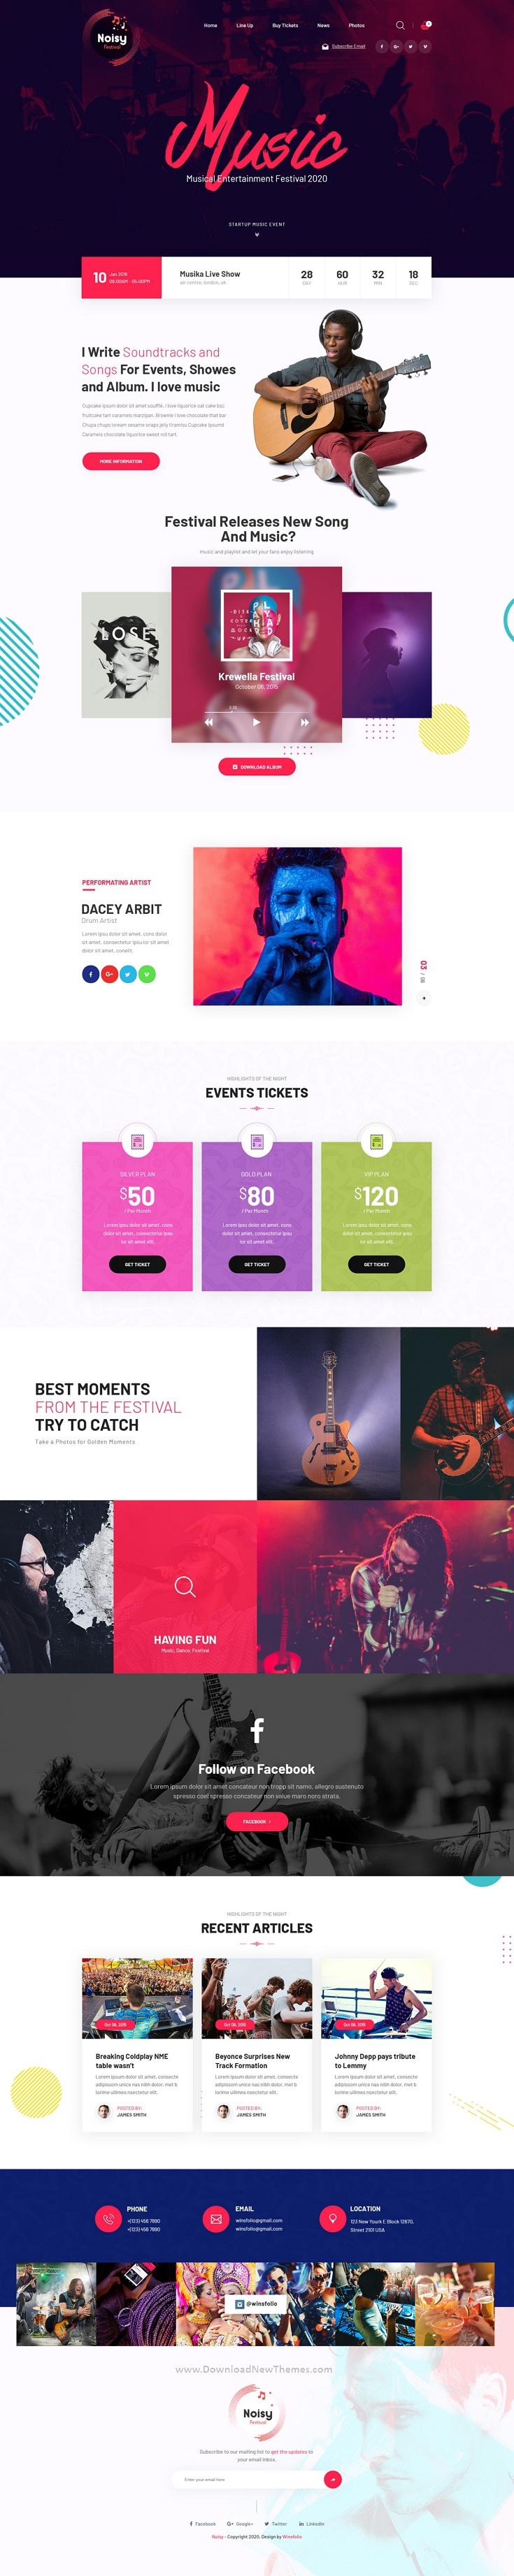 Music Adobe XD Template